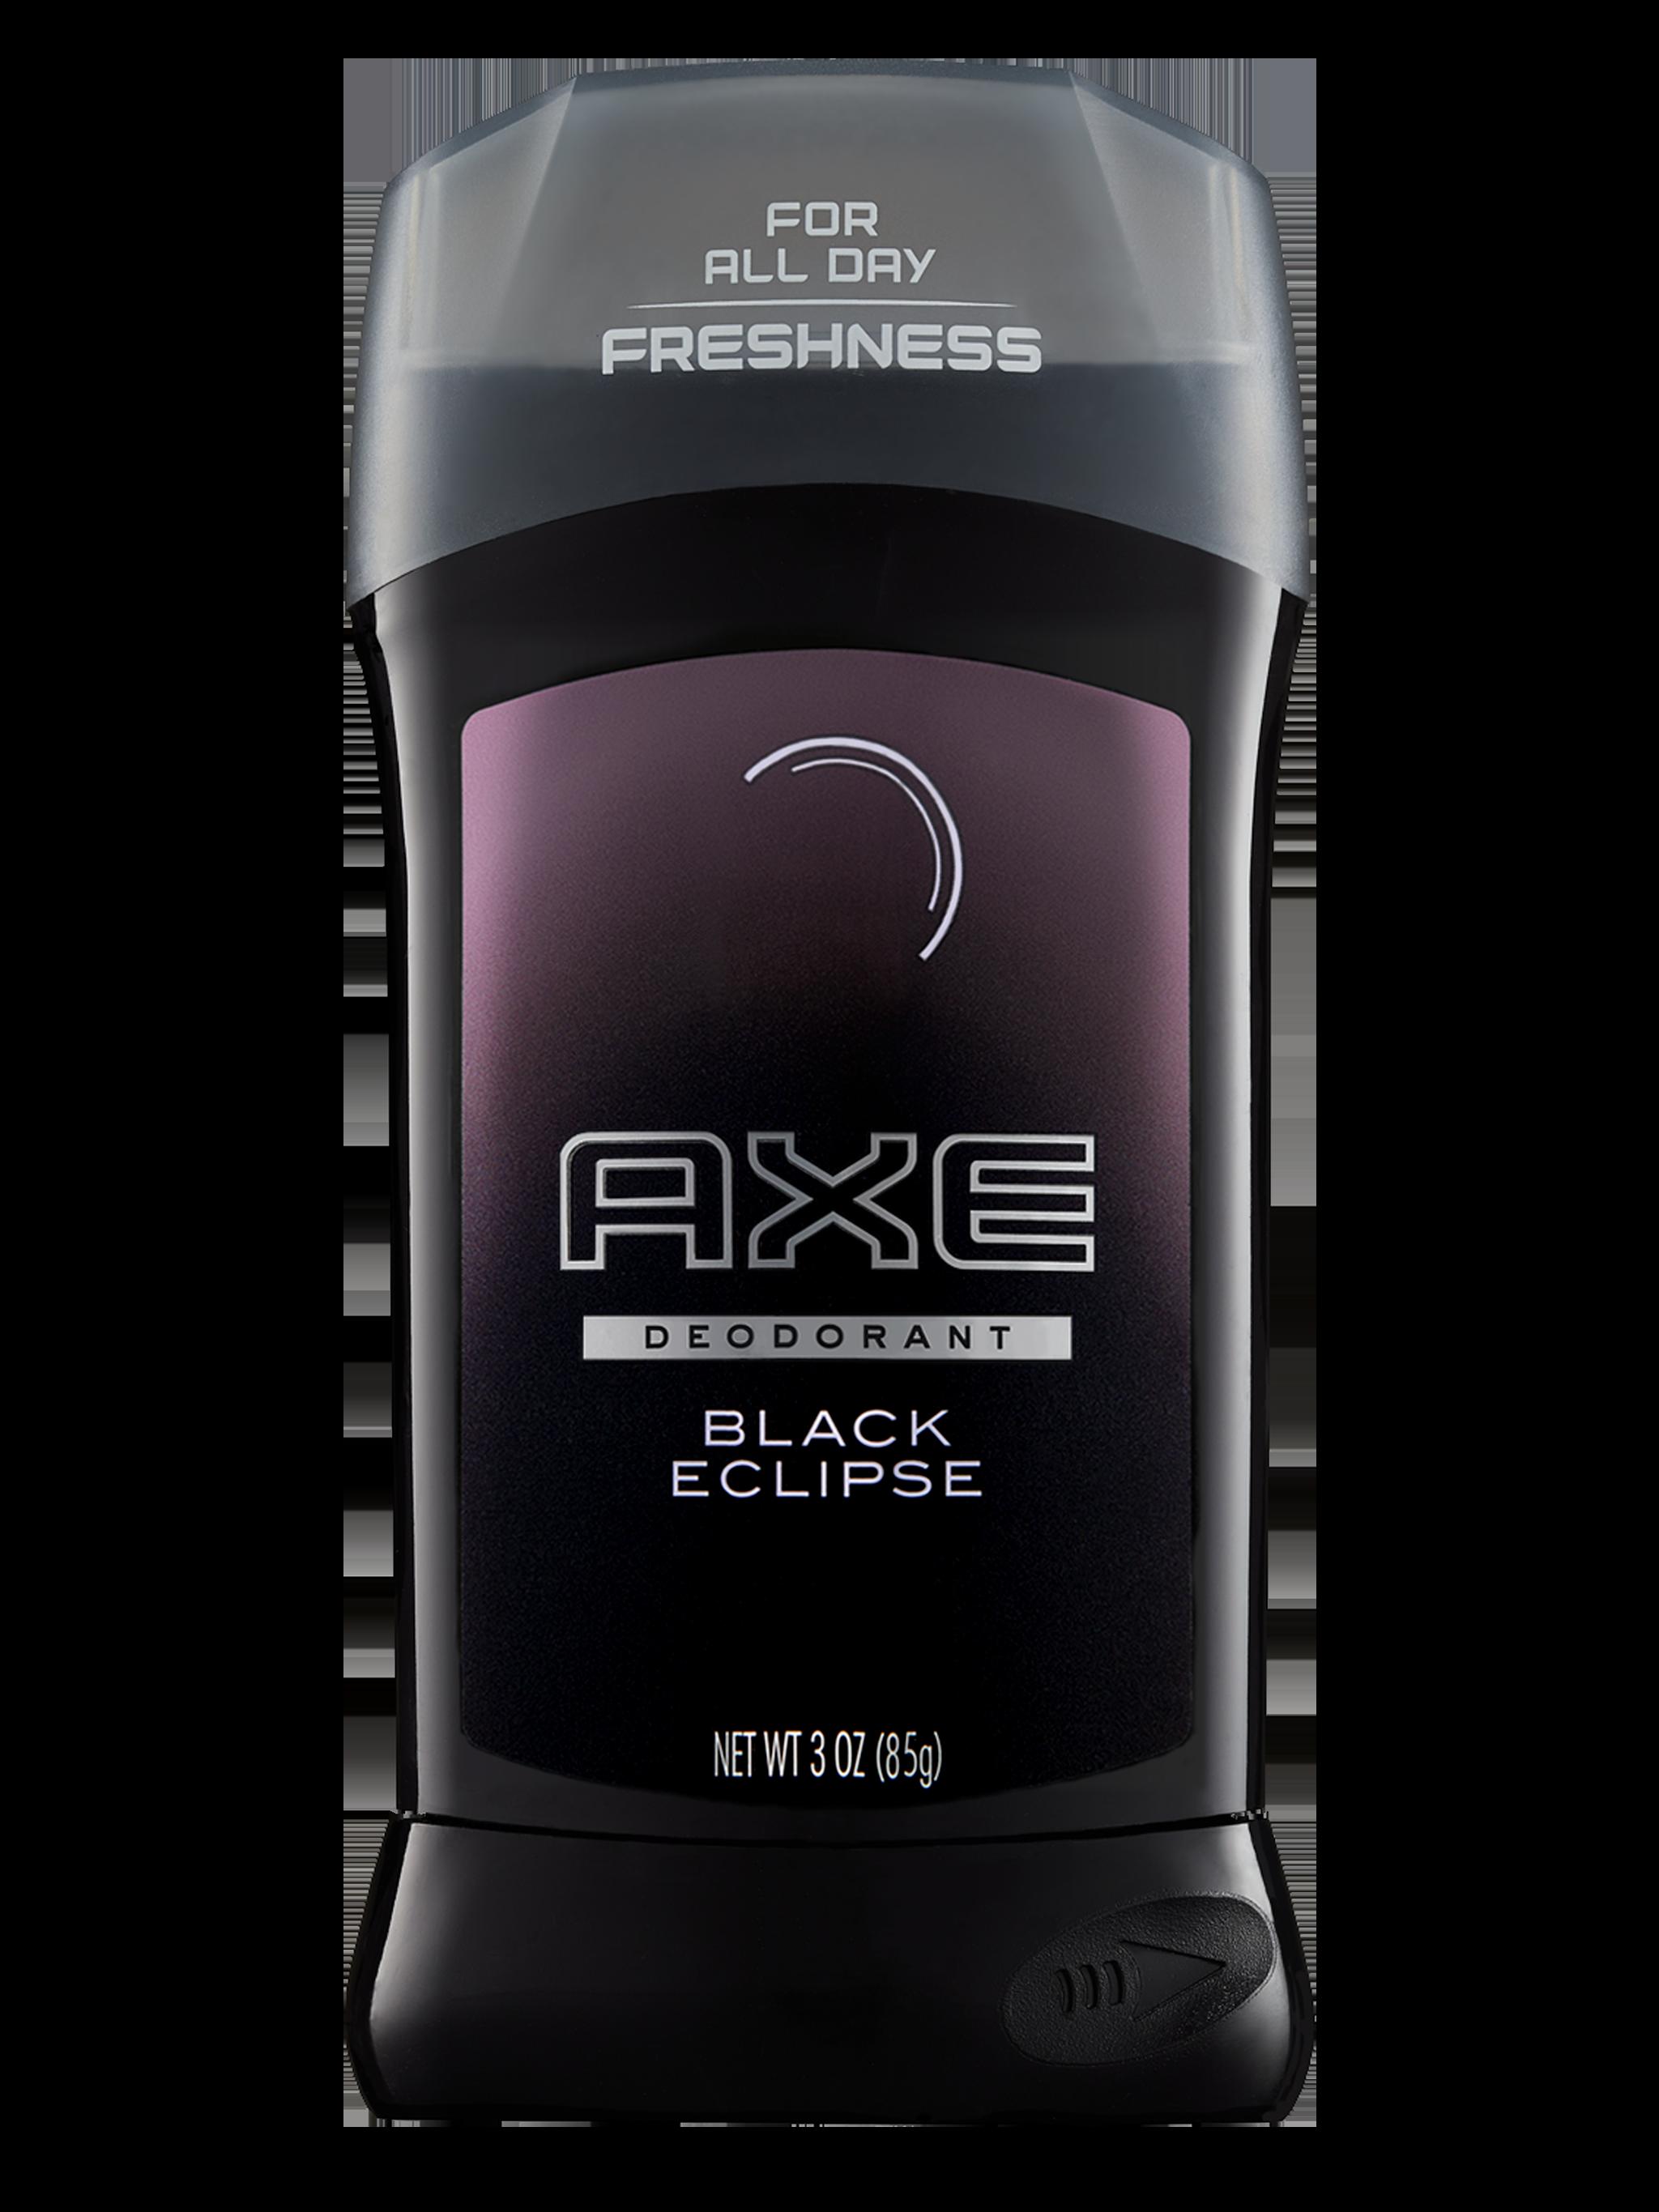 Deodorant clipart body odor. Black deordorant stick axe